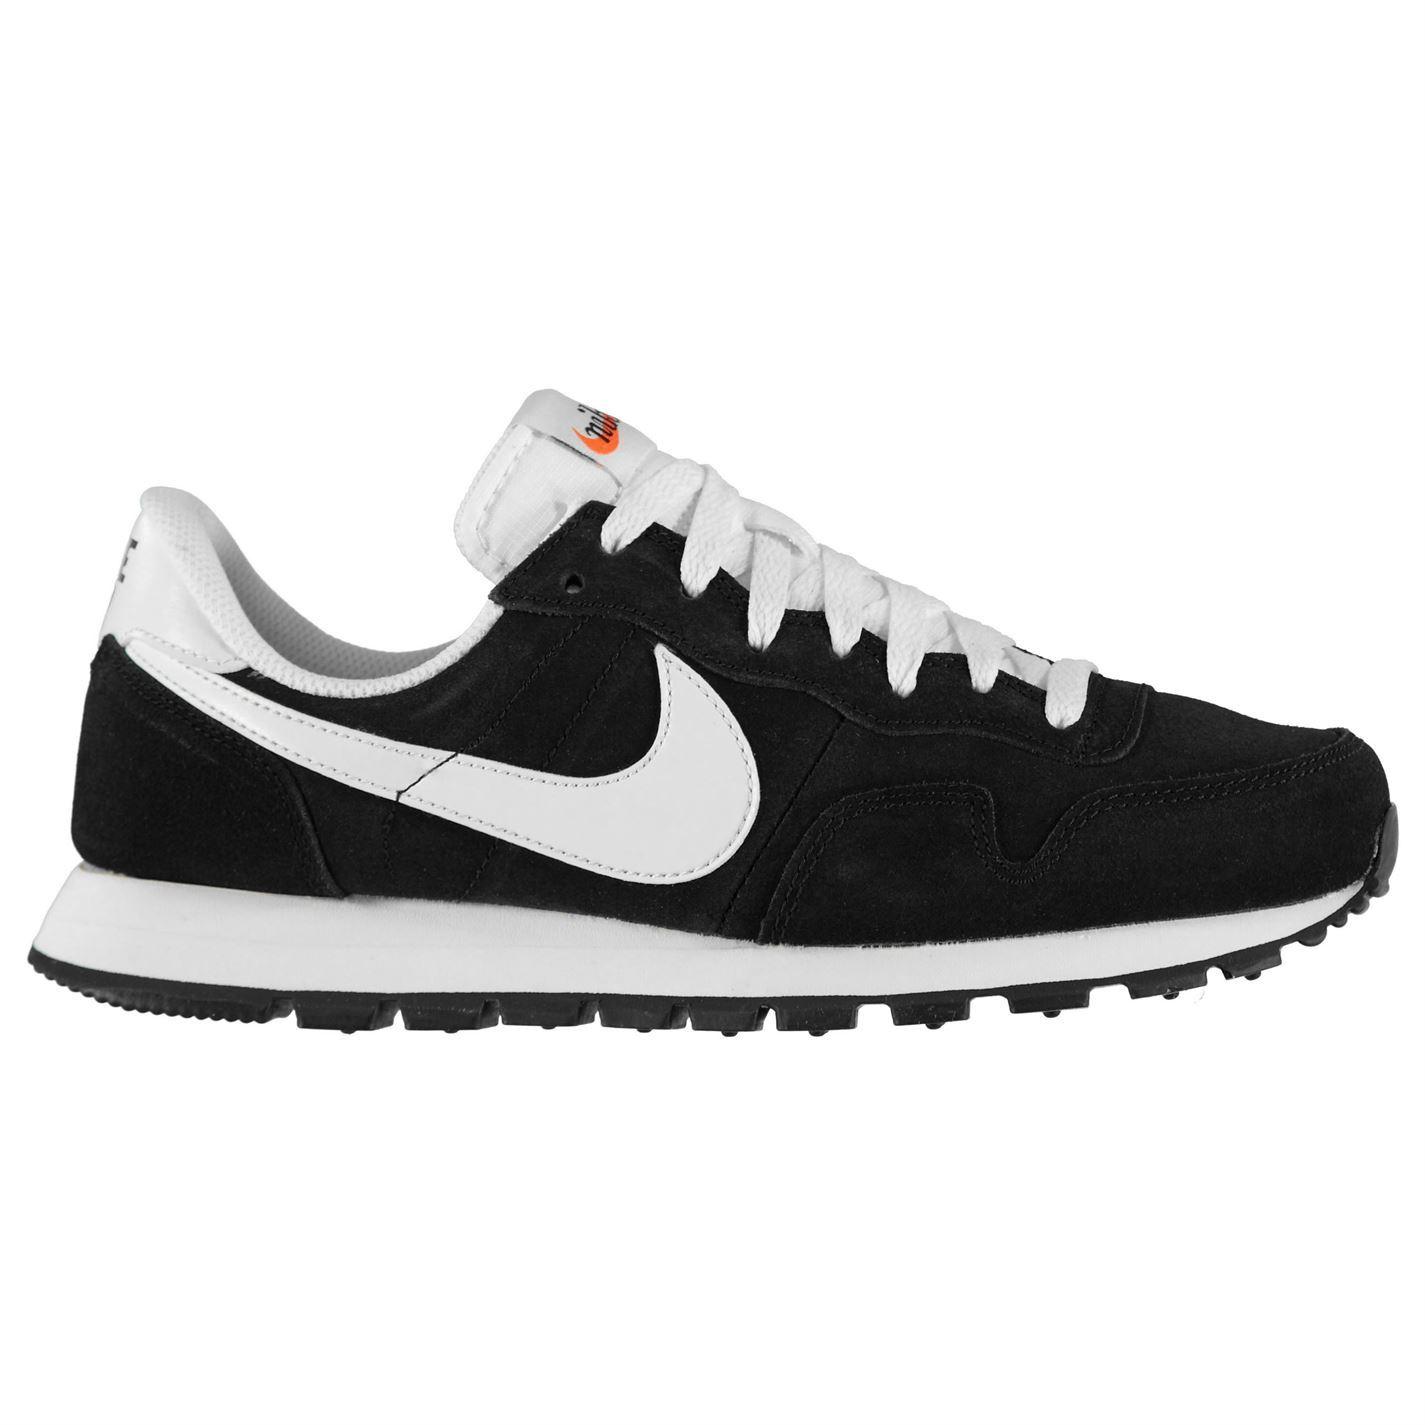 Nike Air Pegasus 83 83 83 Trainers Uomo Athleisure Footwear scarpe scarpe da ginnastica 1ece76